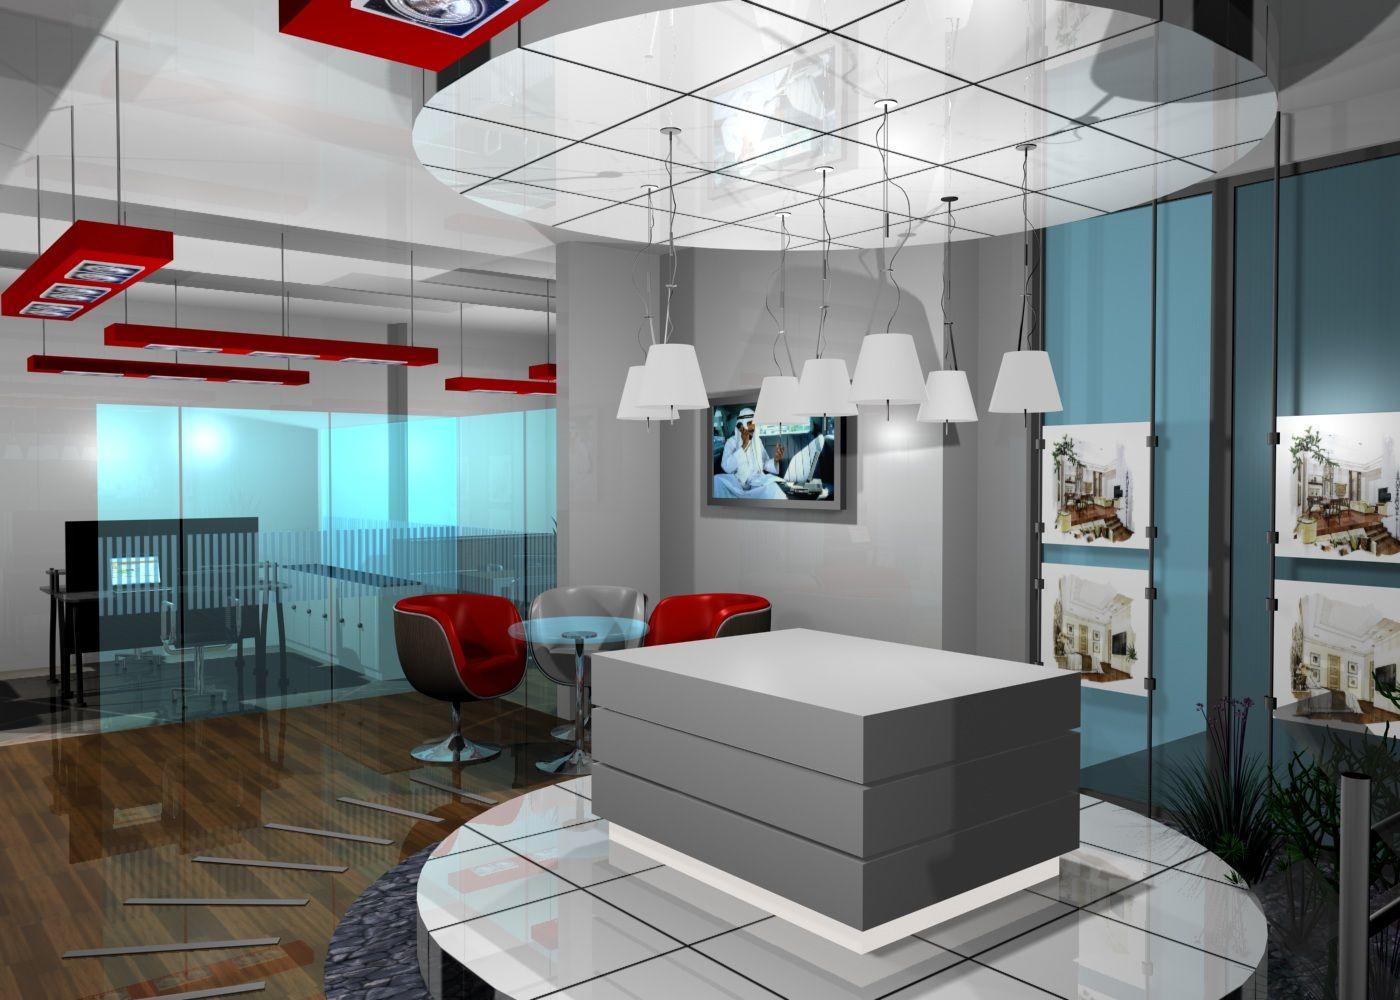 Gurooji design platinum real estate office design - How to take interior photos for real estate ...